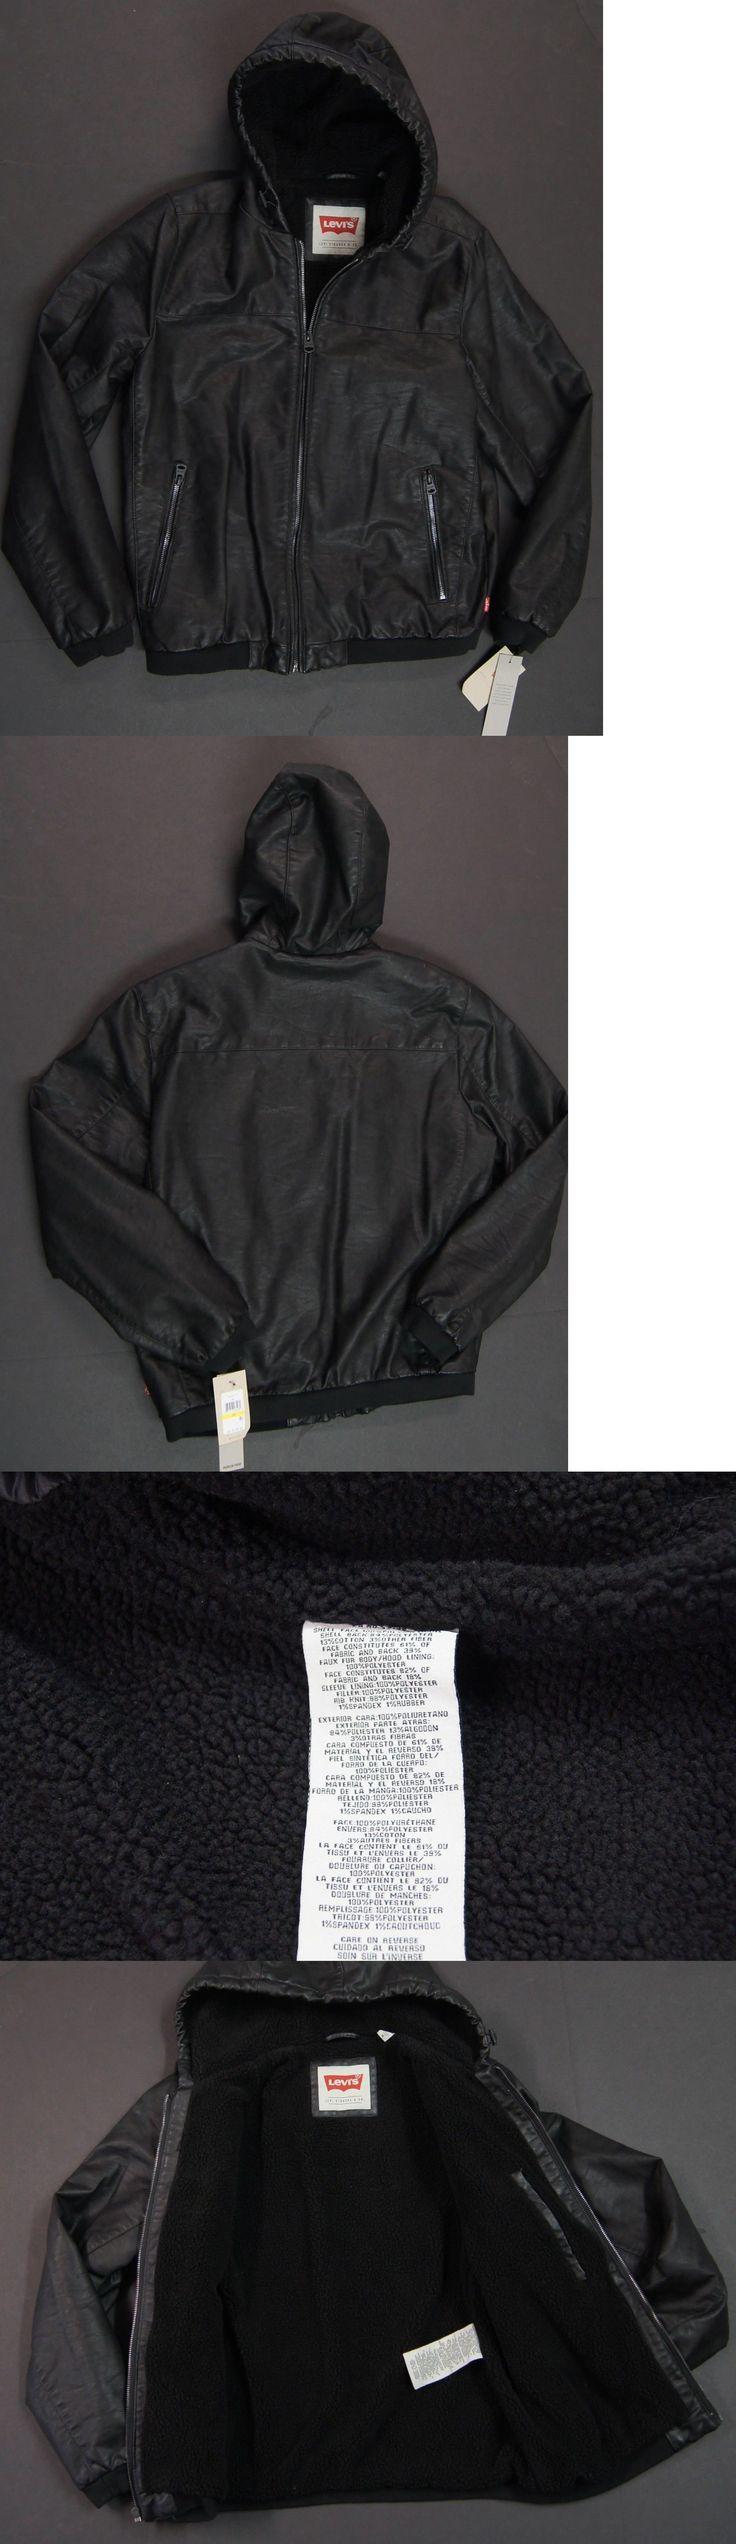 Top 25+ best Hooded bomber jacket ideas on Pinterest | Stone ...